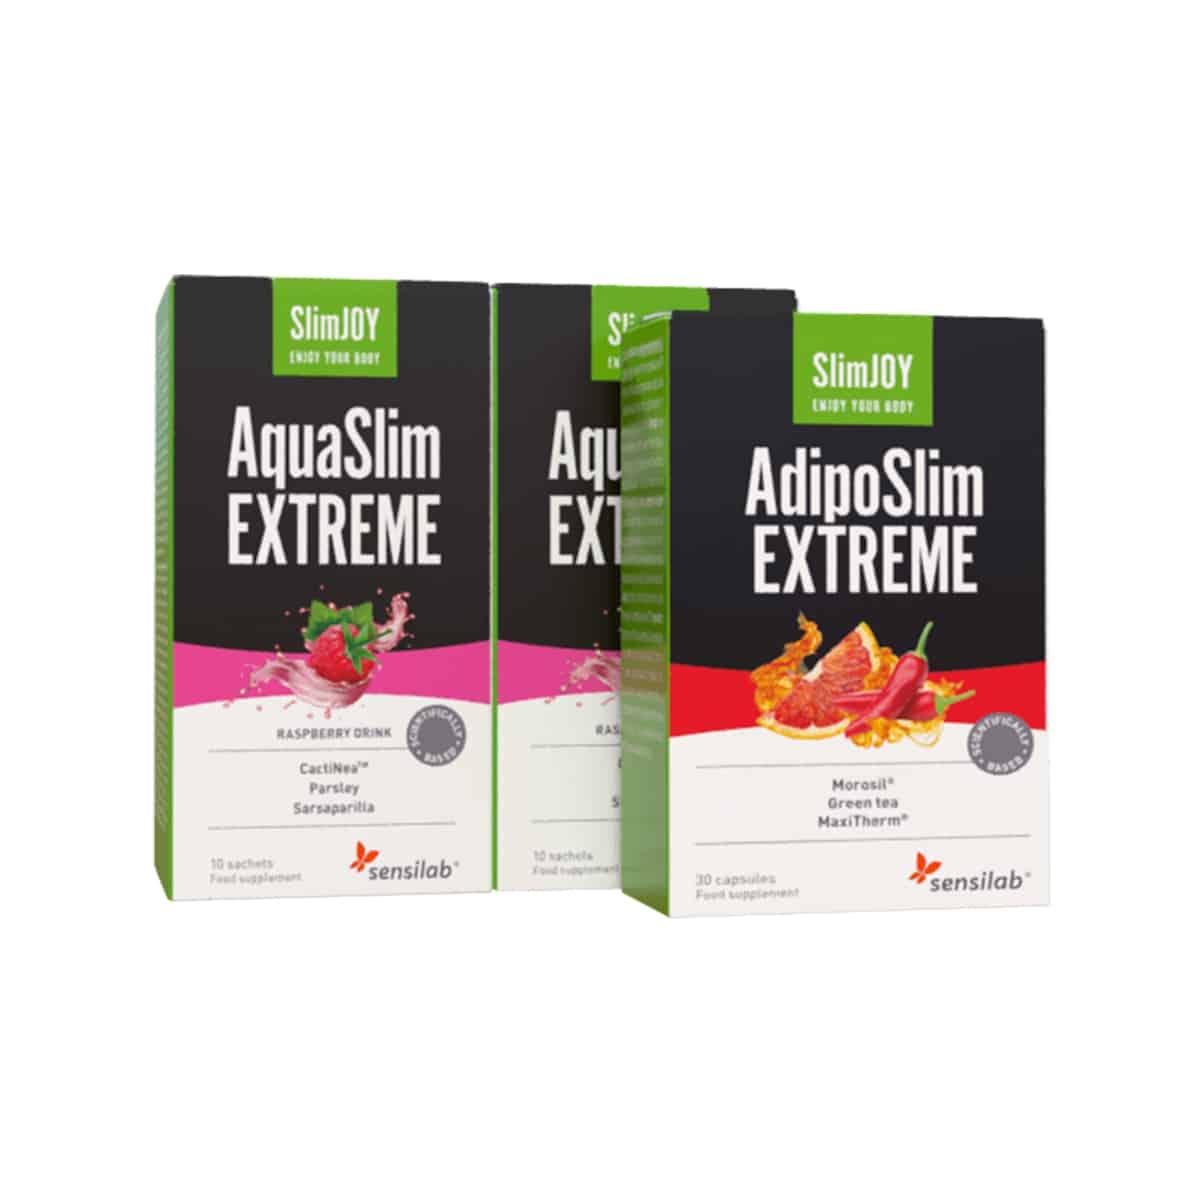 SlimJOY Flat Tummy Ireland AquaSlim AdipoSlim Weight Loss